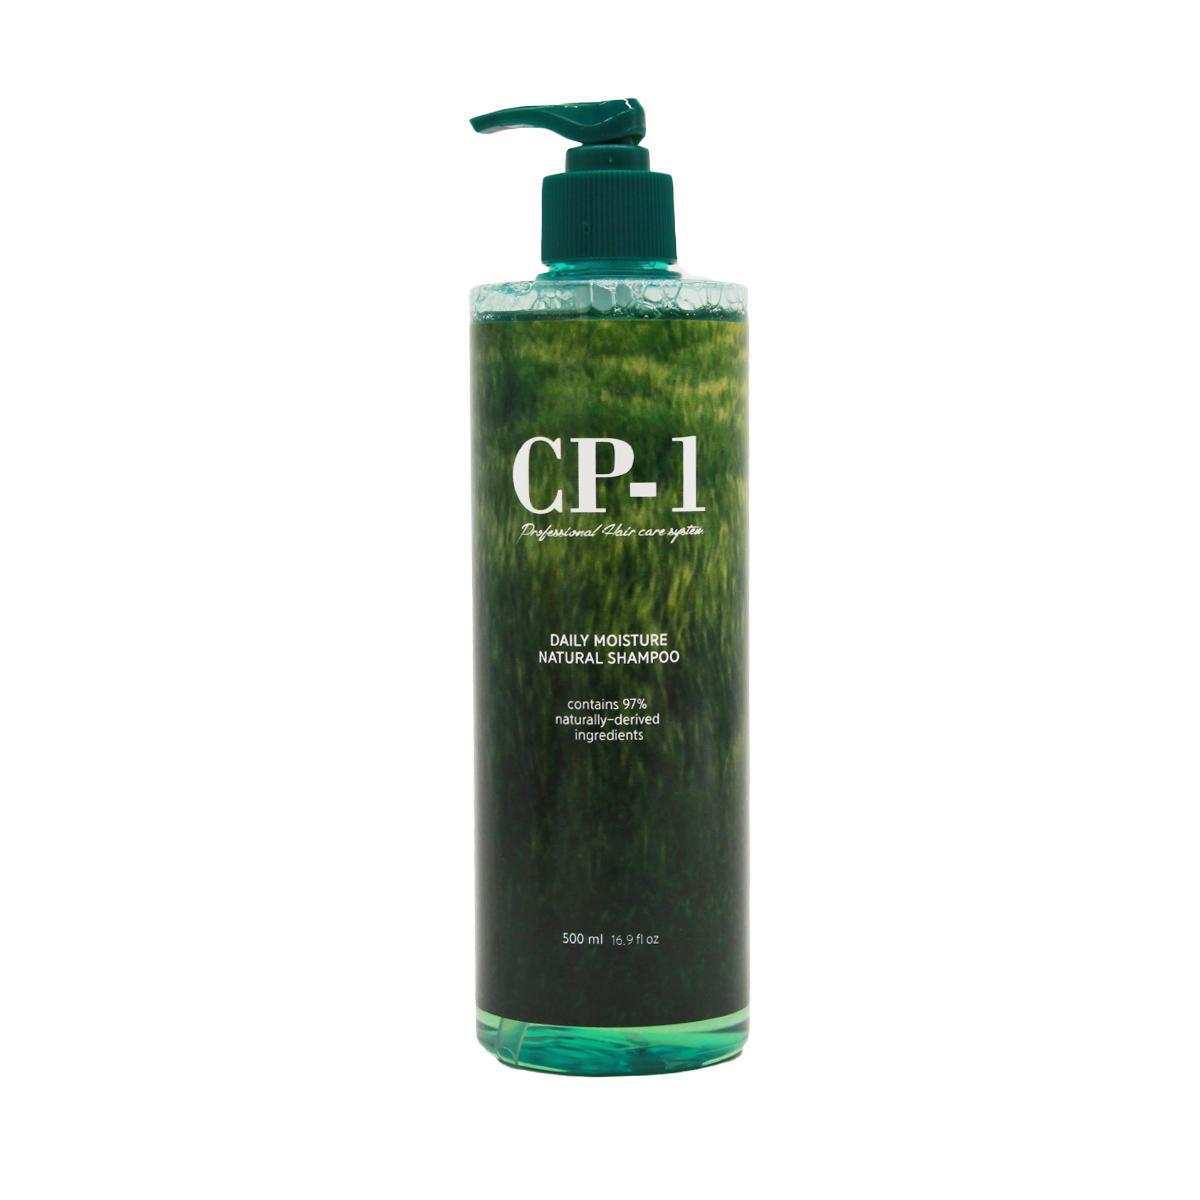 Натуральний шампунь з протеїнами і зеленим чаєм Esthetic House CP-1 Daily Moisture Natural shampoo